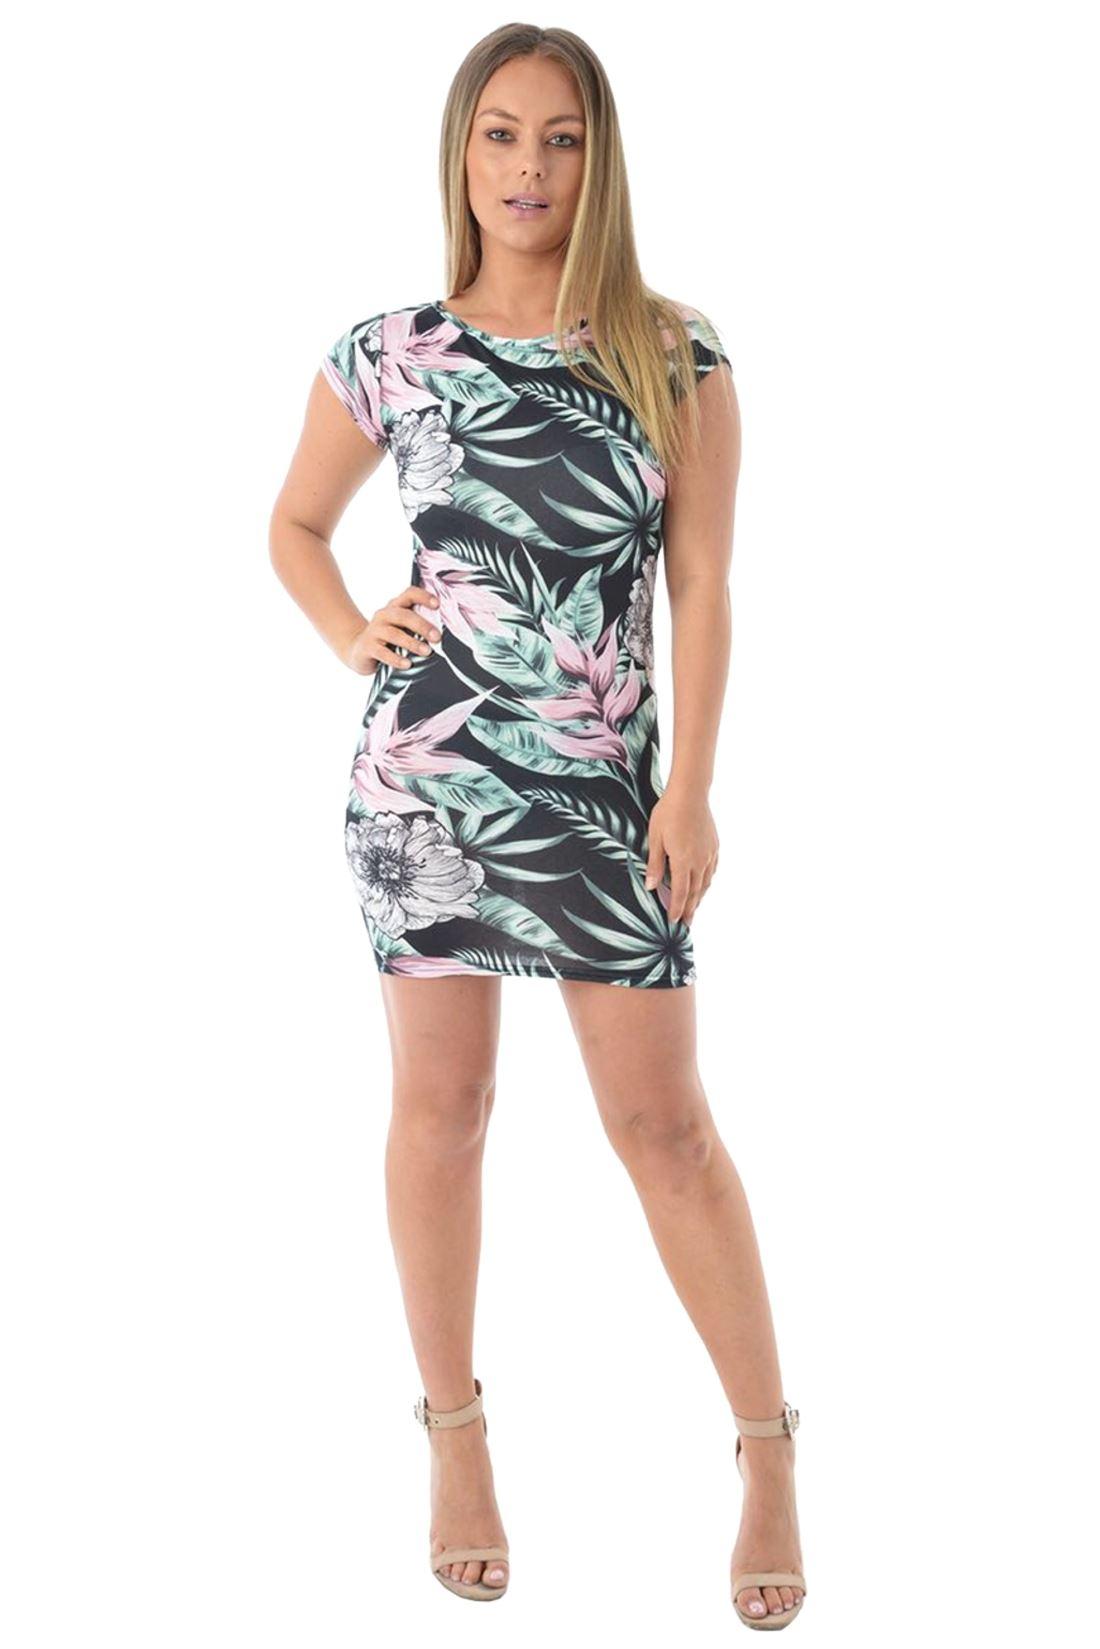 New-Ladies-Cap-Sleeve-Leaf-Floral-Print-Bodycon-Stretch-Summer-Mini-Tunic-Dress